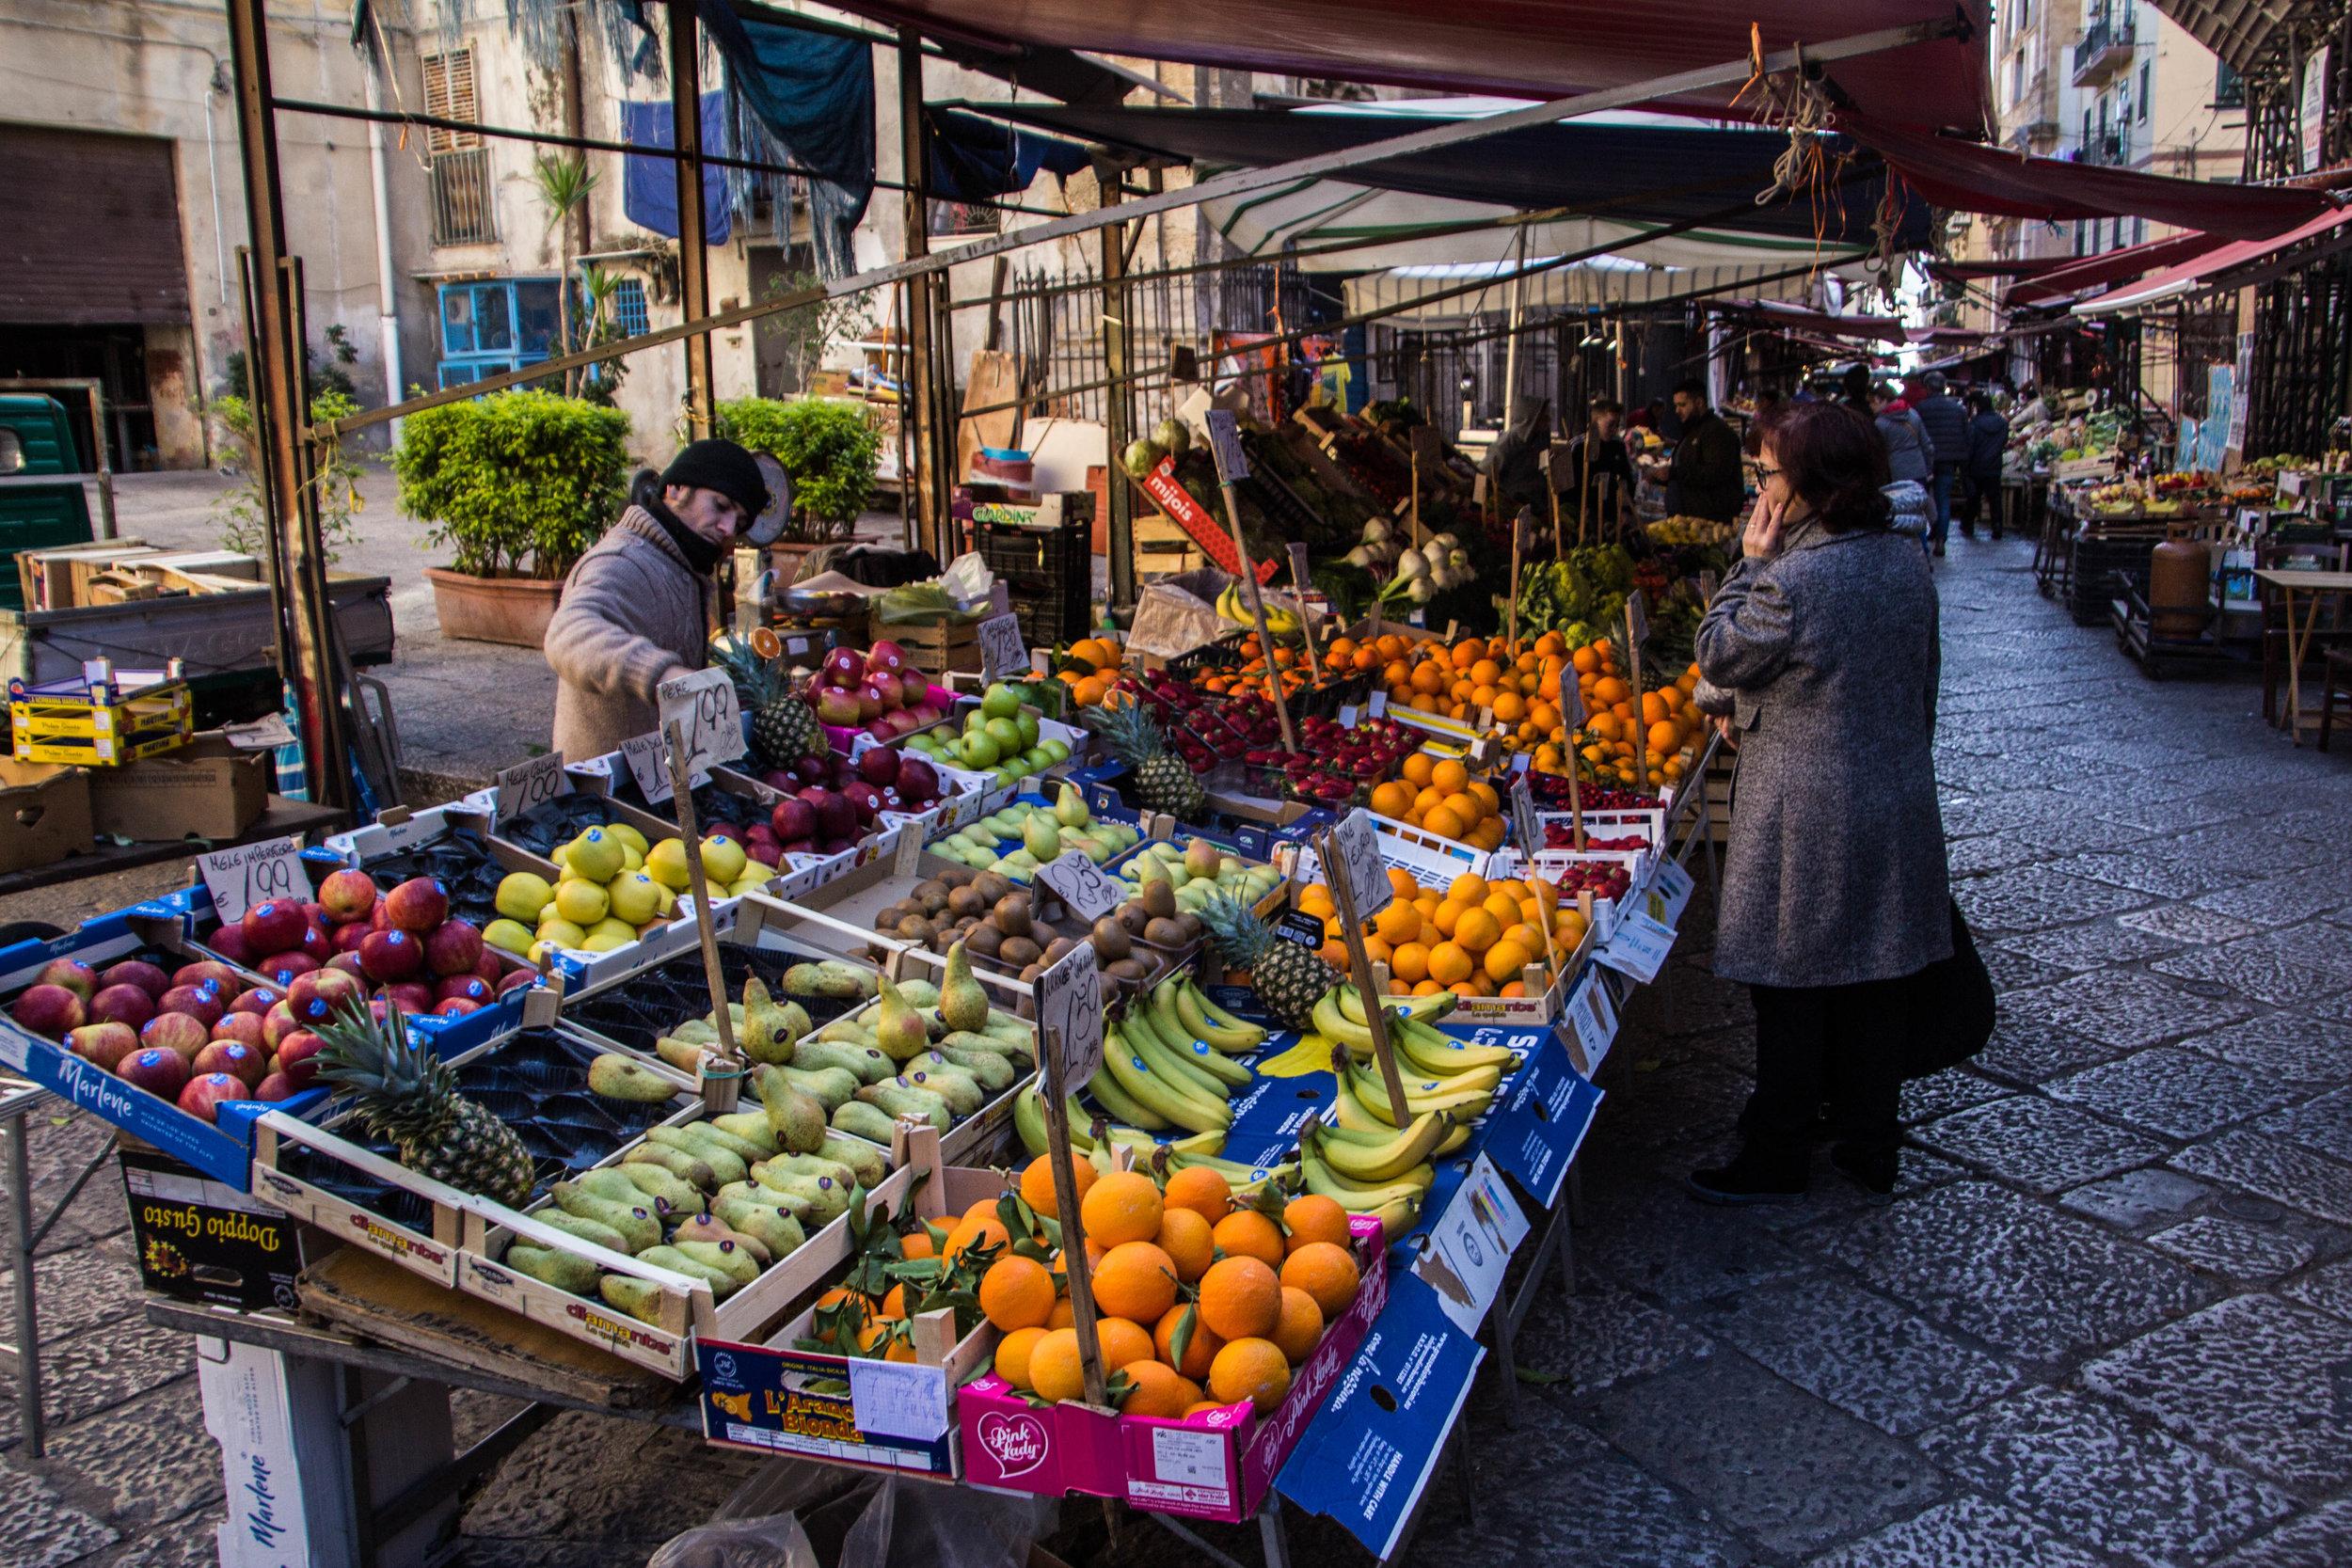 street-markets-palermo-sicily-6.jpg